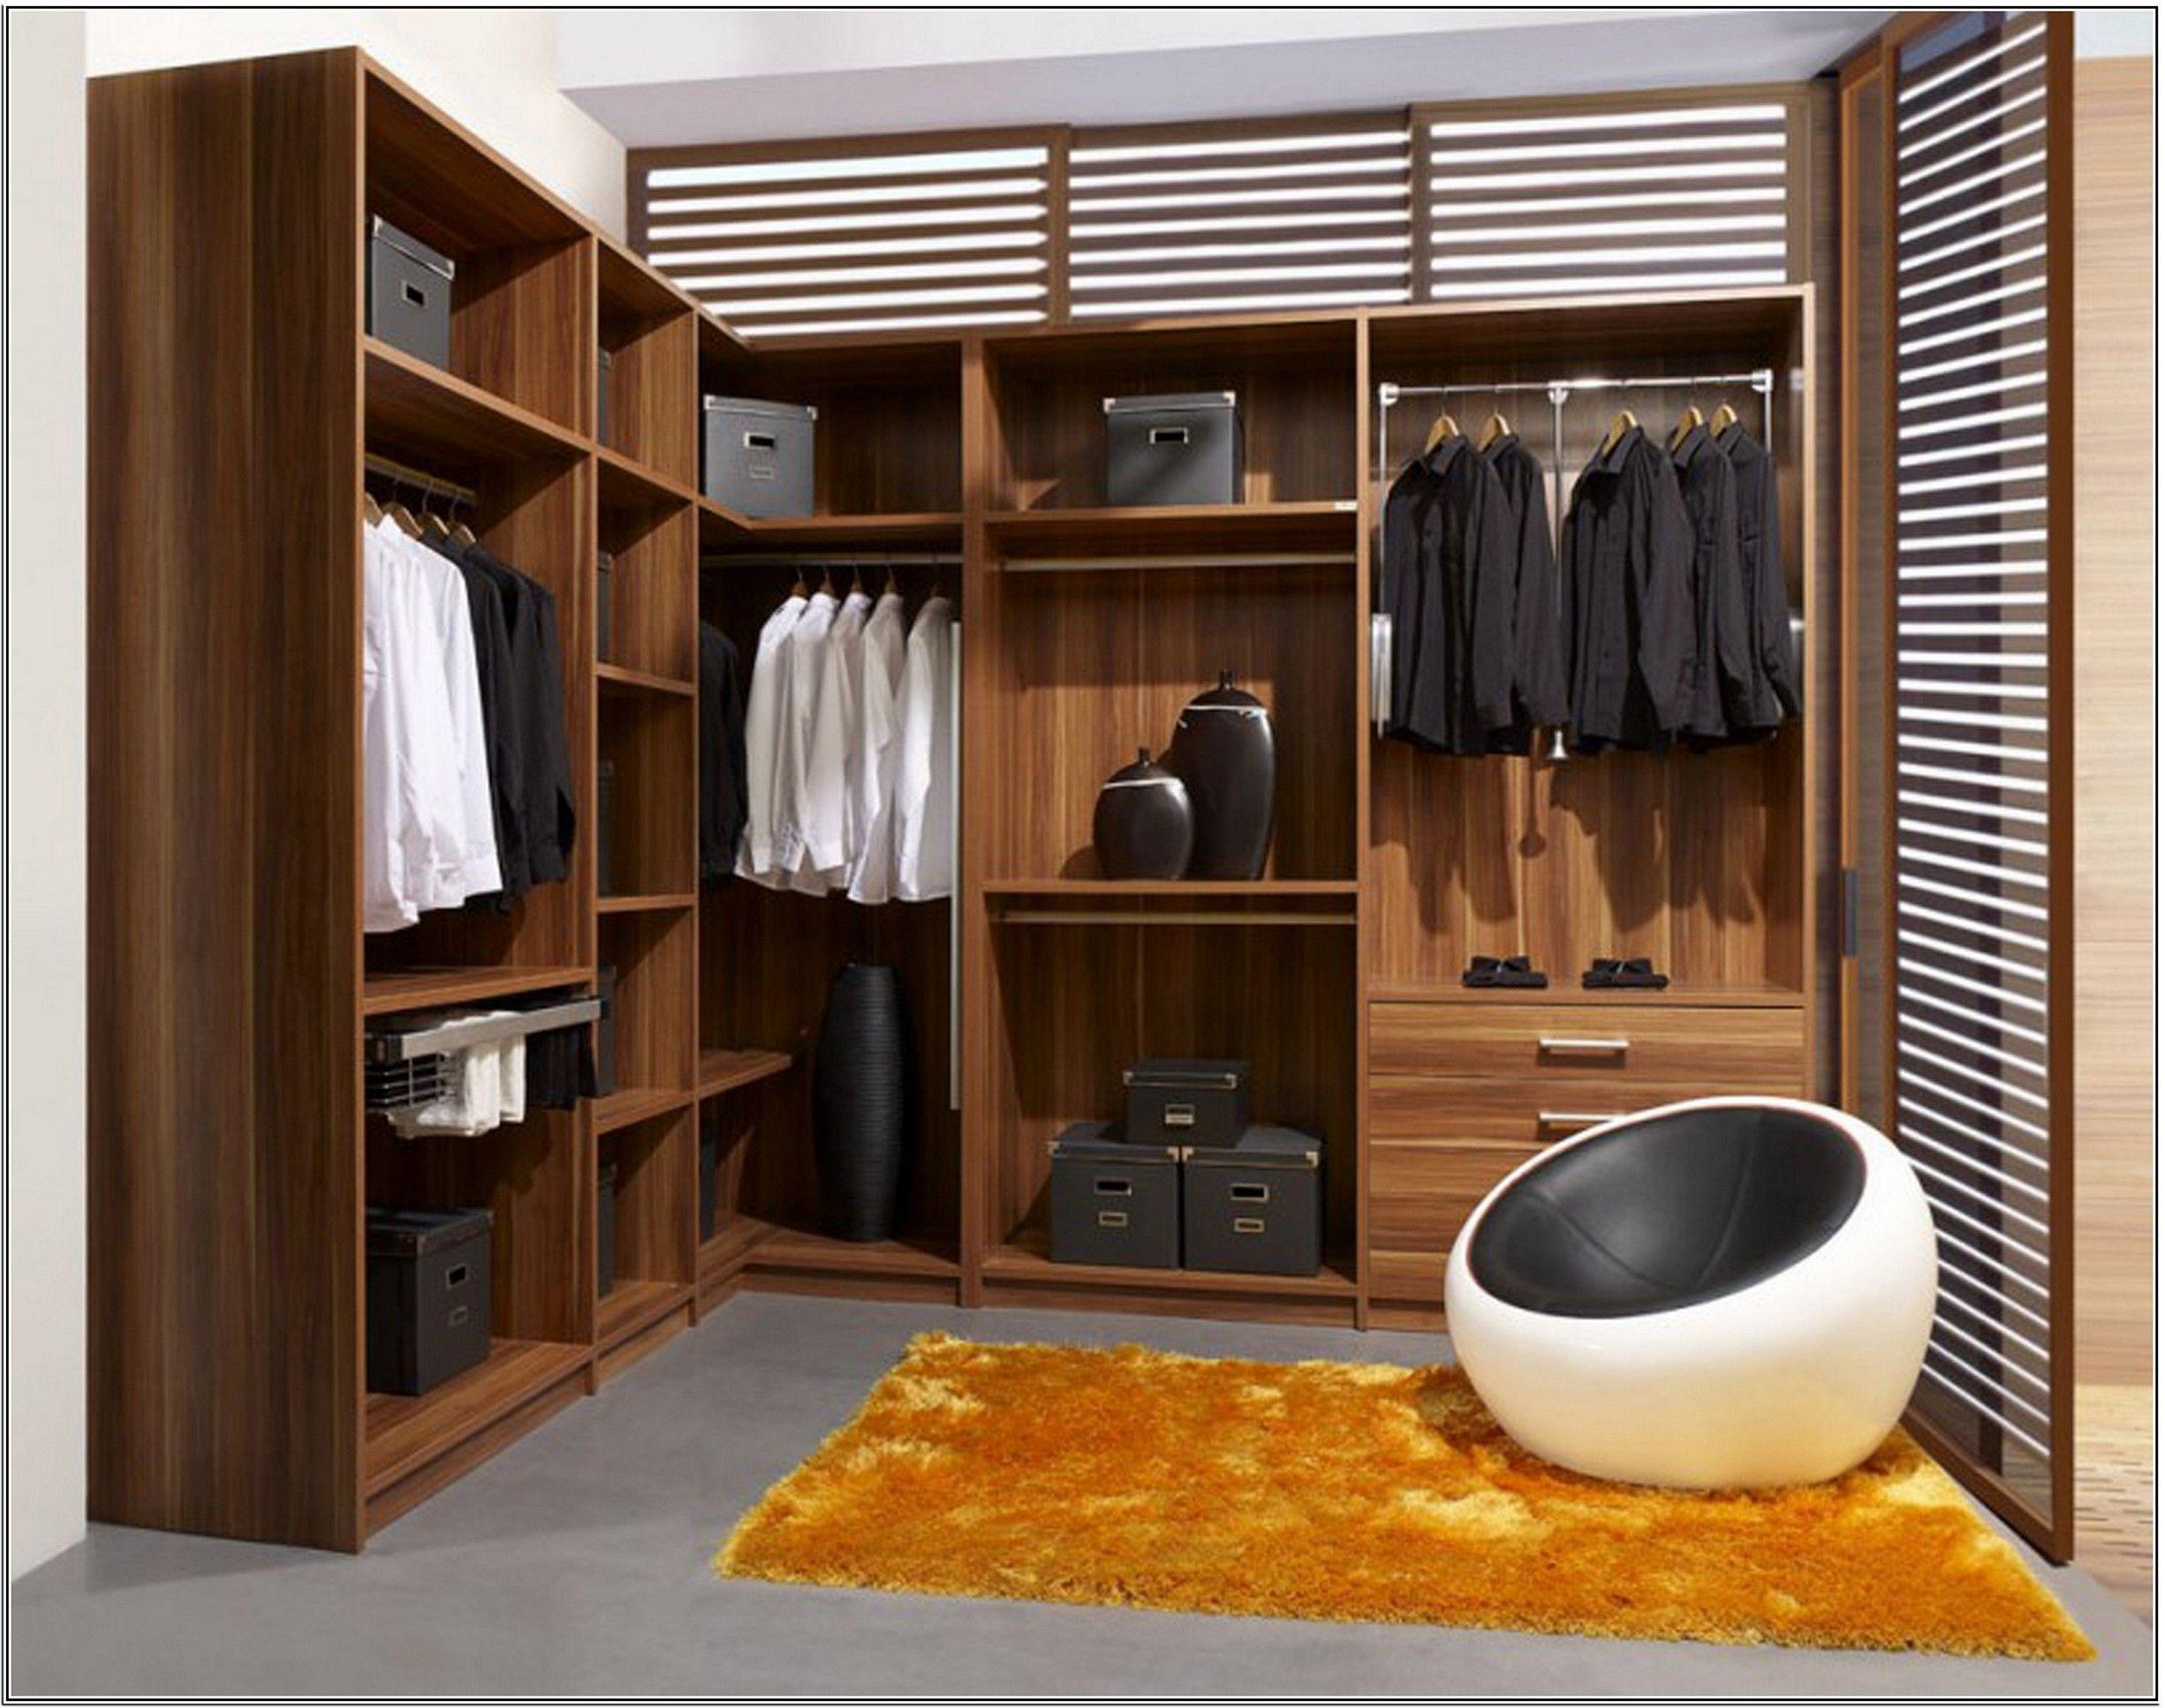 Bedroom Closet Designs Simple Walk In Closet Design  Walk In Closet Design  Pinterest